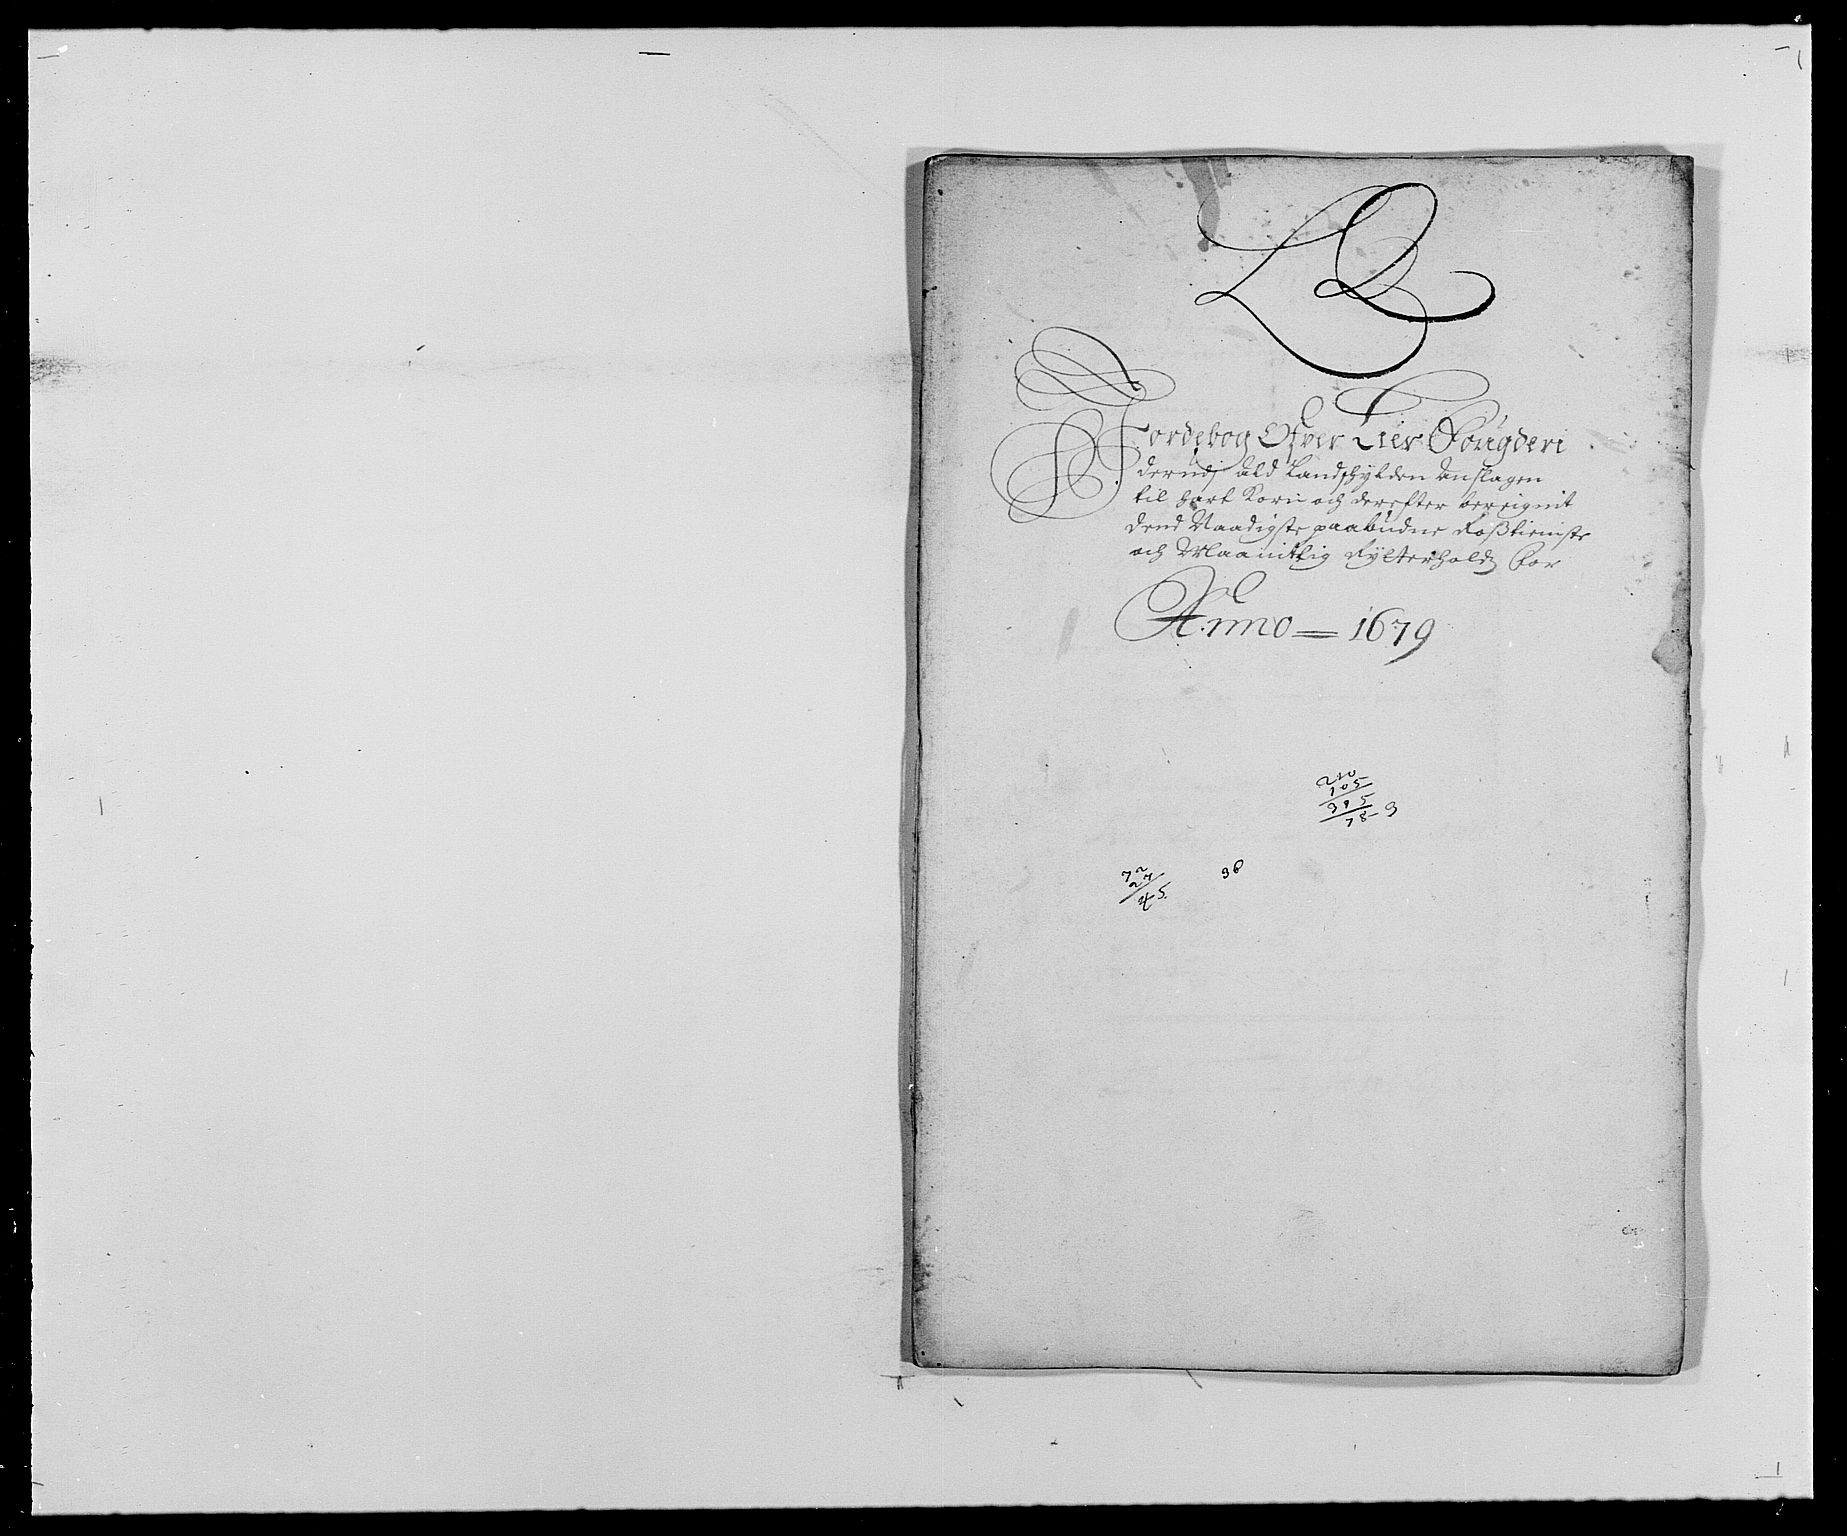 RA, Rentekammeret inntil 1814, Reviderte regnskaper, Fogderegnskap, R27/L1686: Fogderegnskap Lier, 1678-1686, s. 198